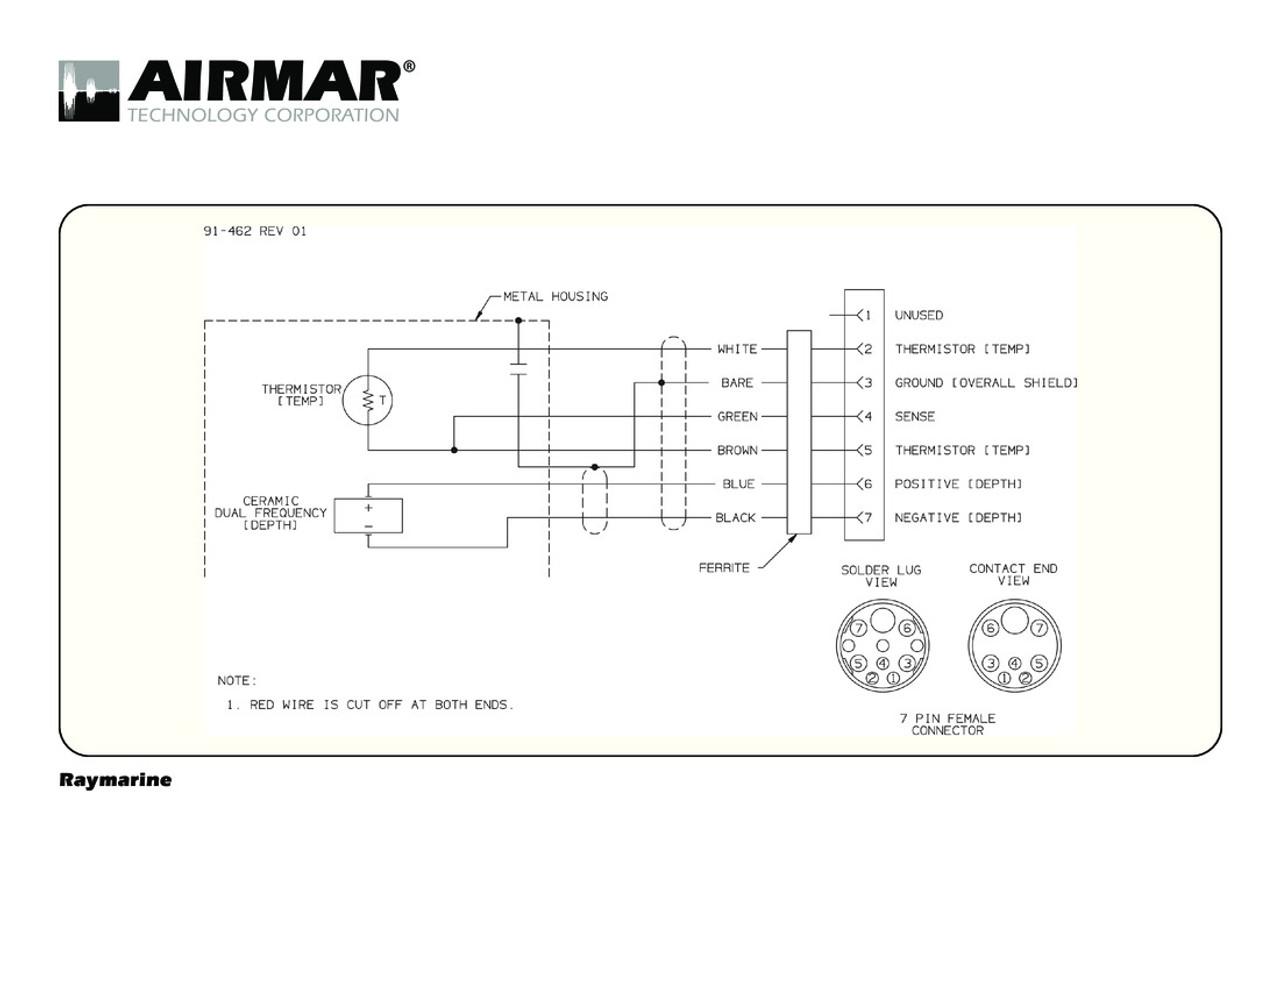 lowrance nmea 0183 wiring diagram free download wiring diagram view lowrance nmea 0183 wiring pictures to [ 1100 x 850 Pixel ]